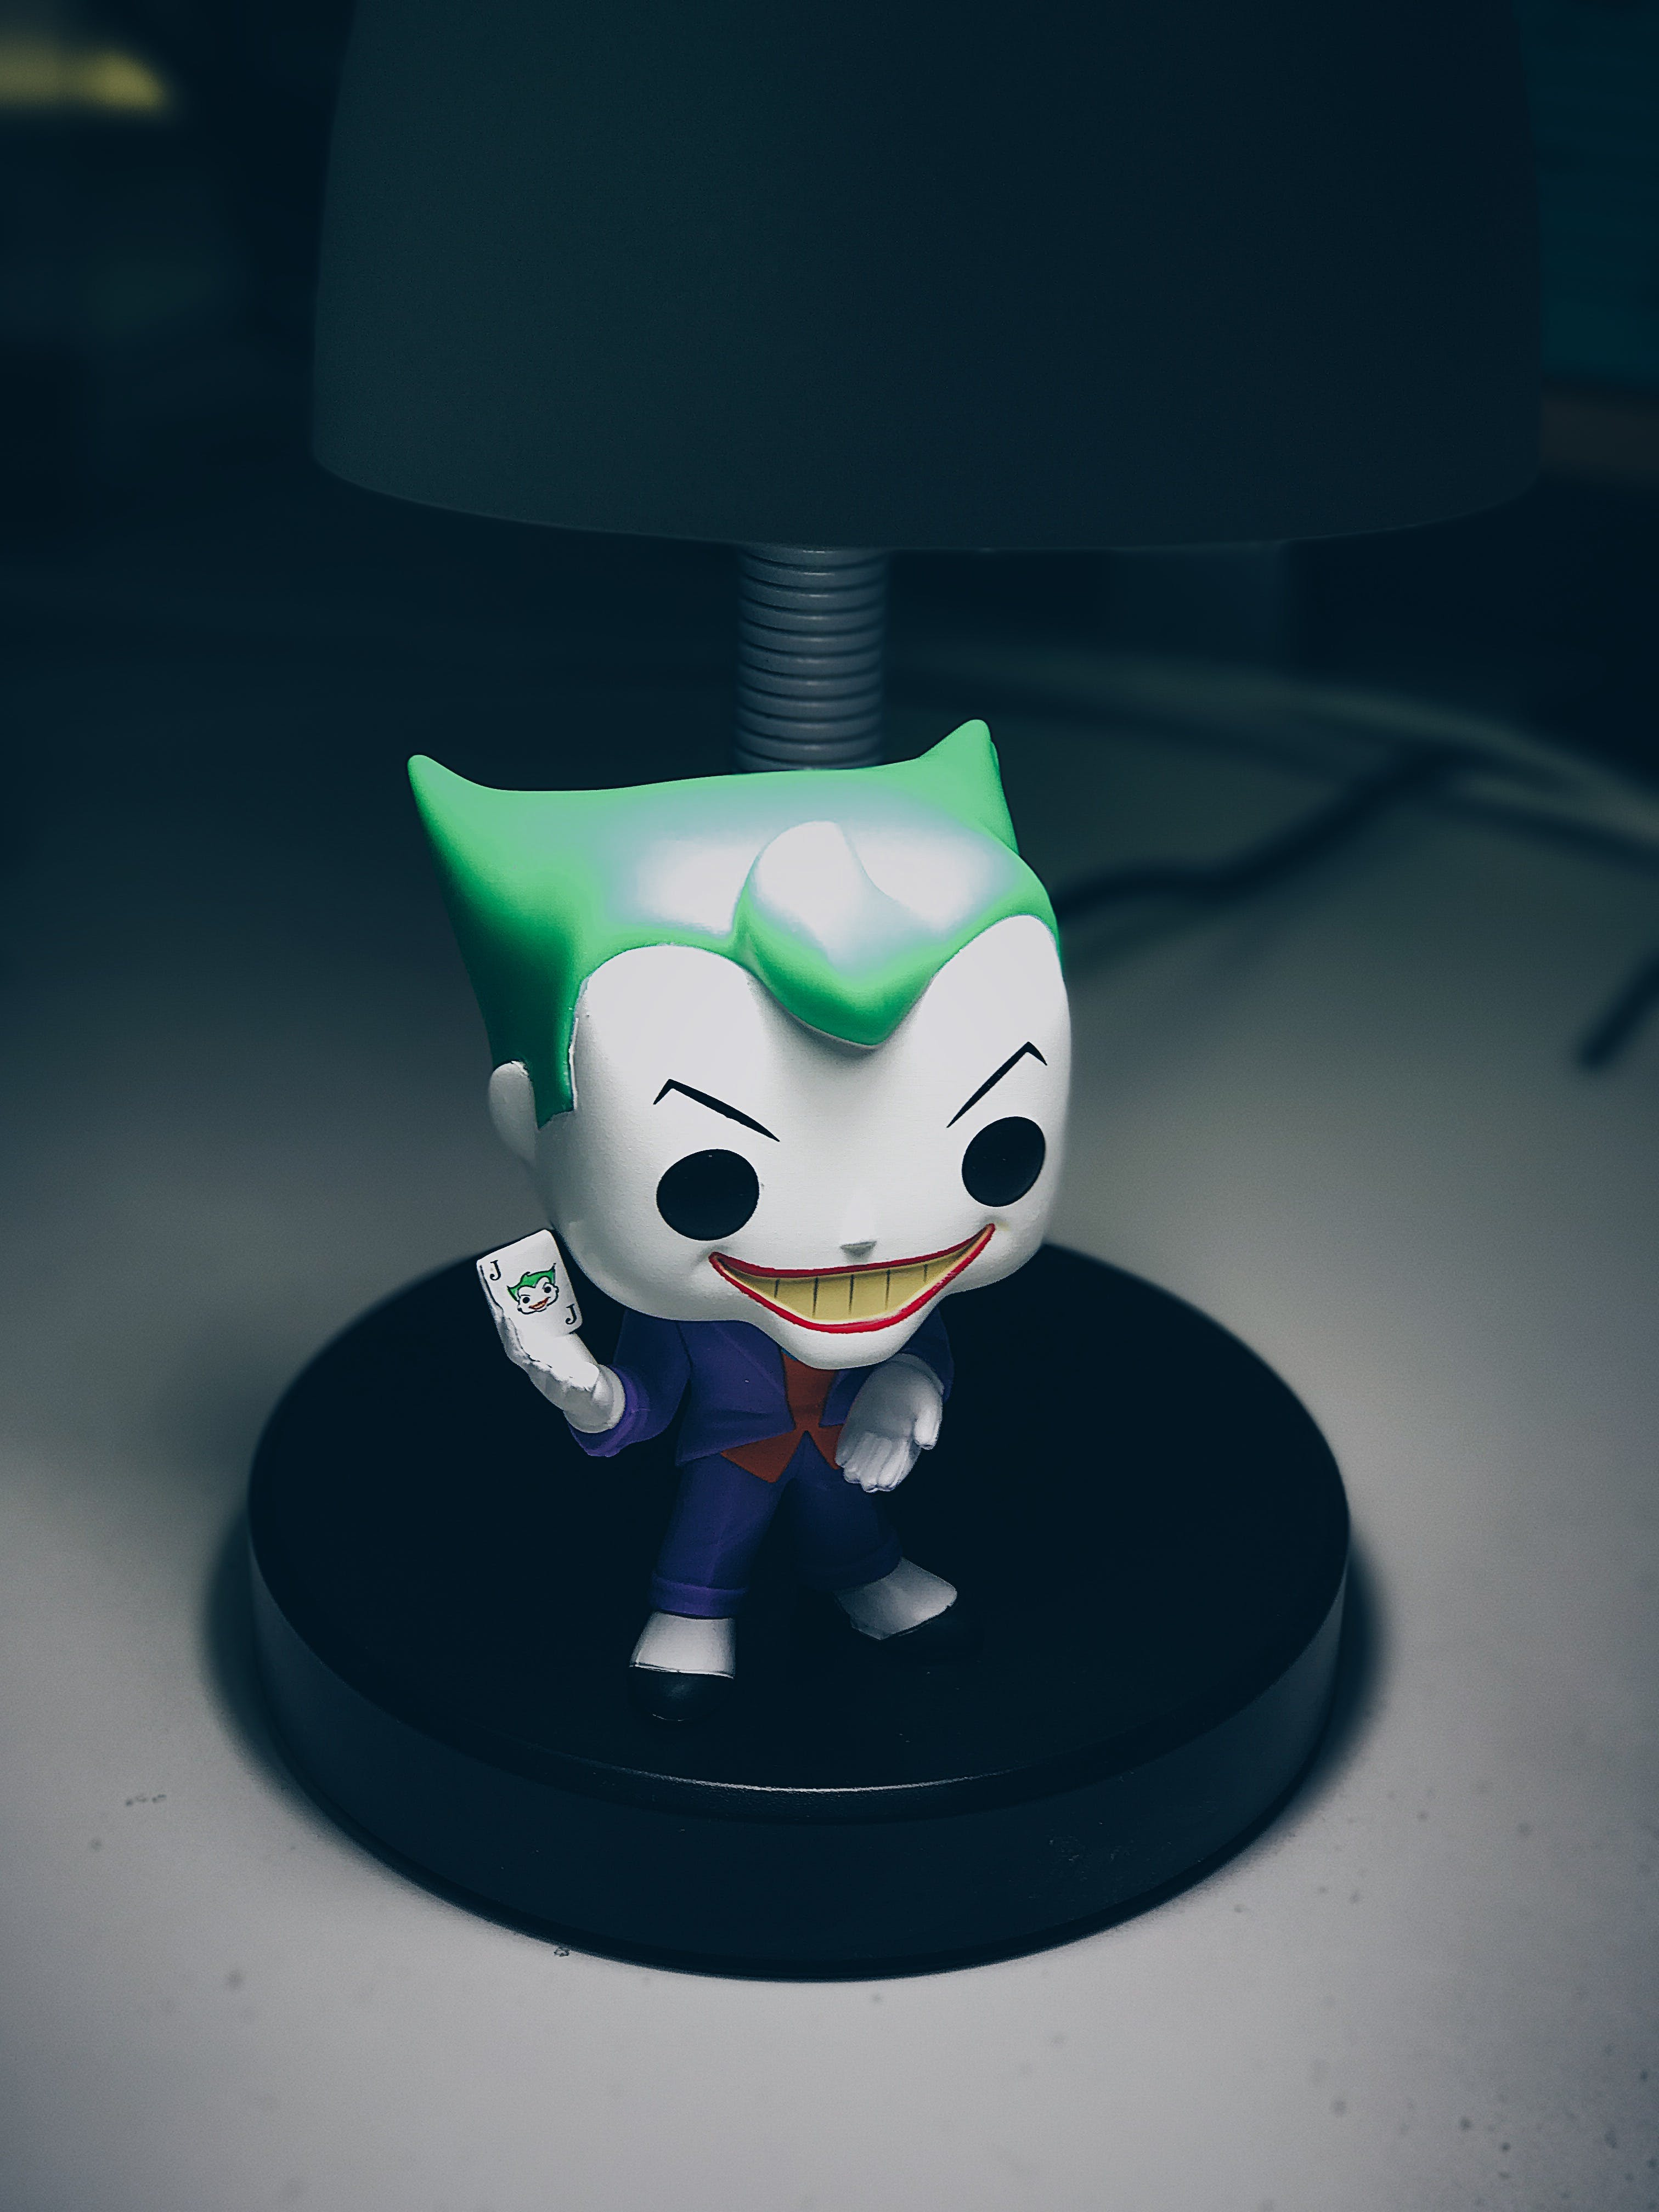 Free stock photo of Funko Pop, Joker, toy